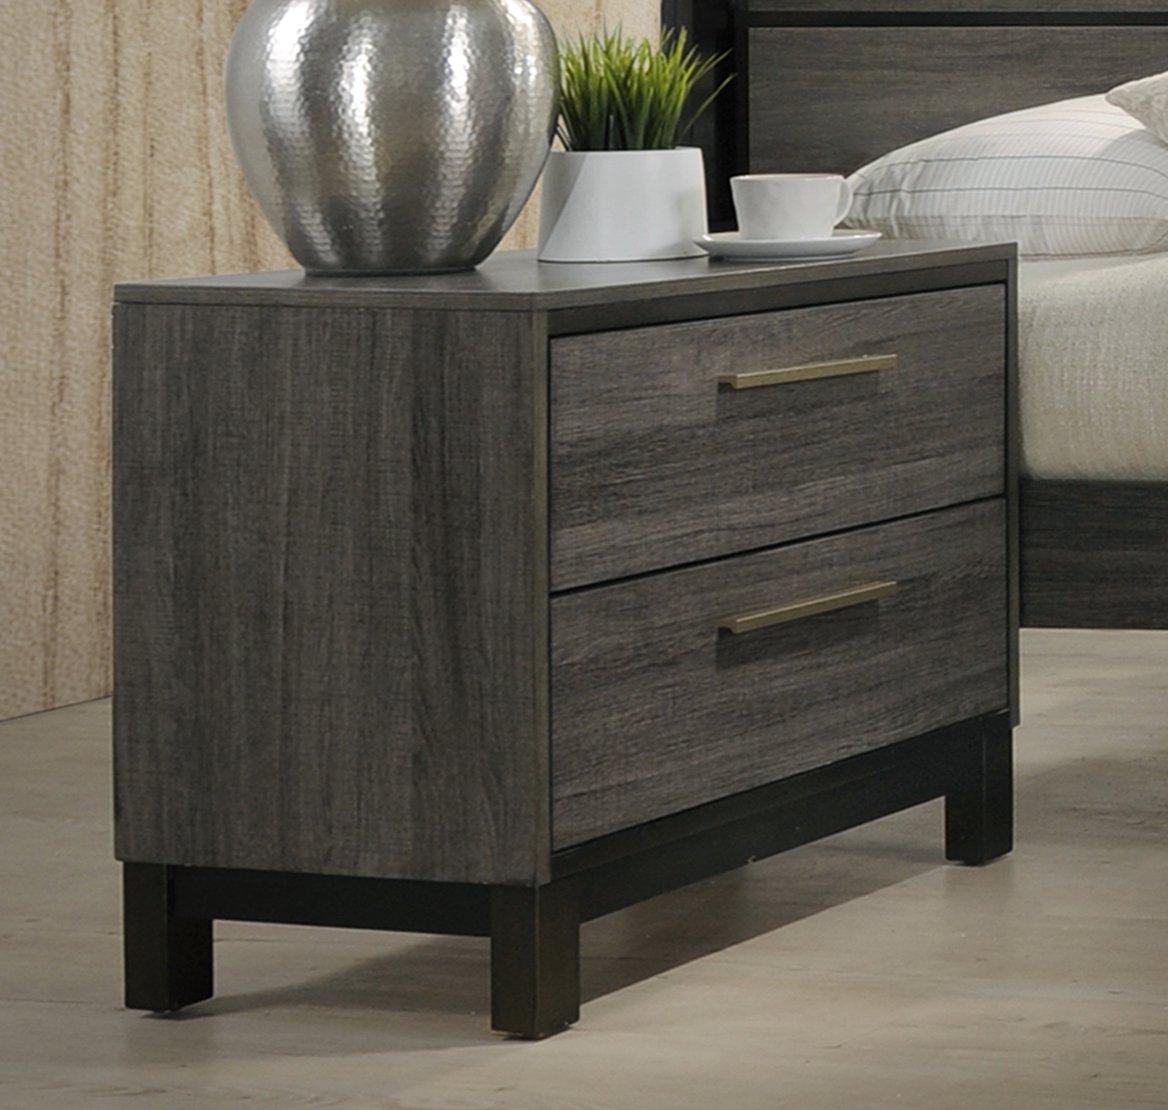 Roundhill Furniture B187N Loana Wood 2-Drawer Nightstand, Antique Grey